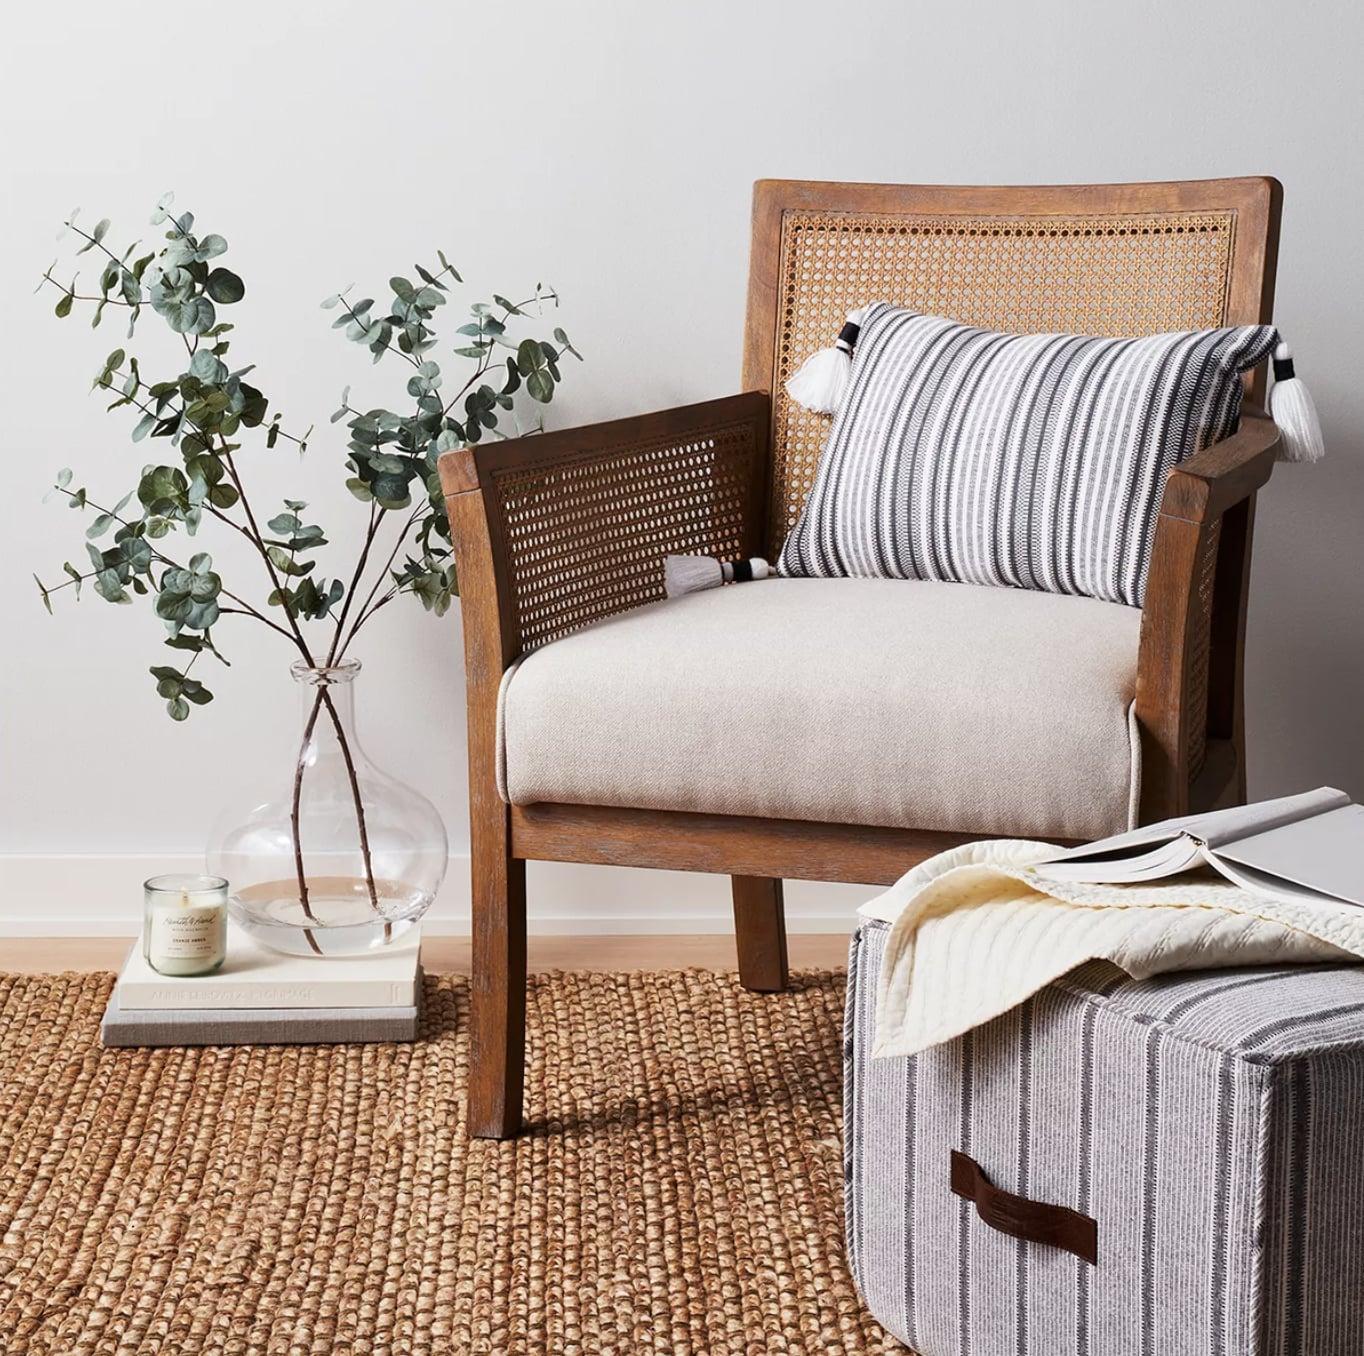 Tufted Half Circle Square Throw Pillow Best Target Decor Under 50 Popsugar Home Uk Photo 19